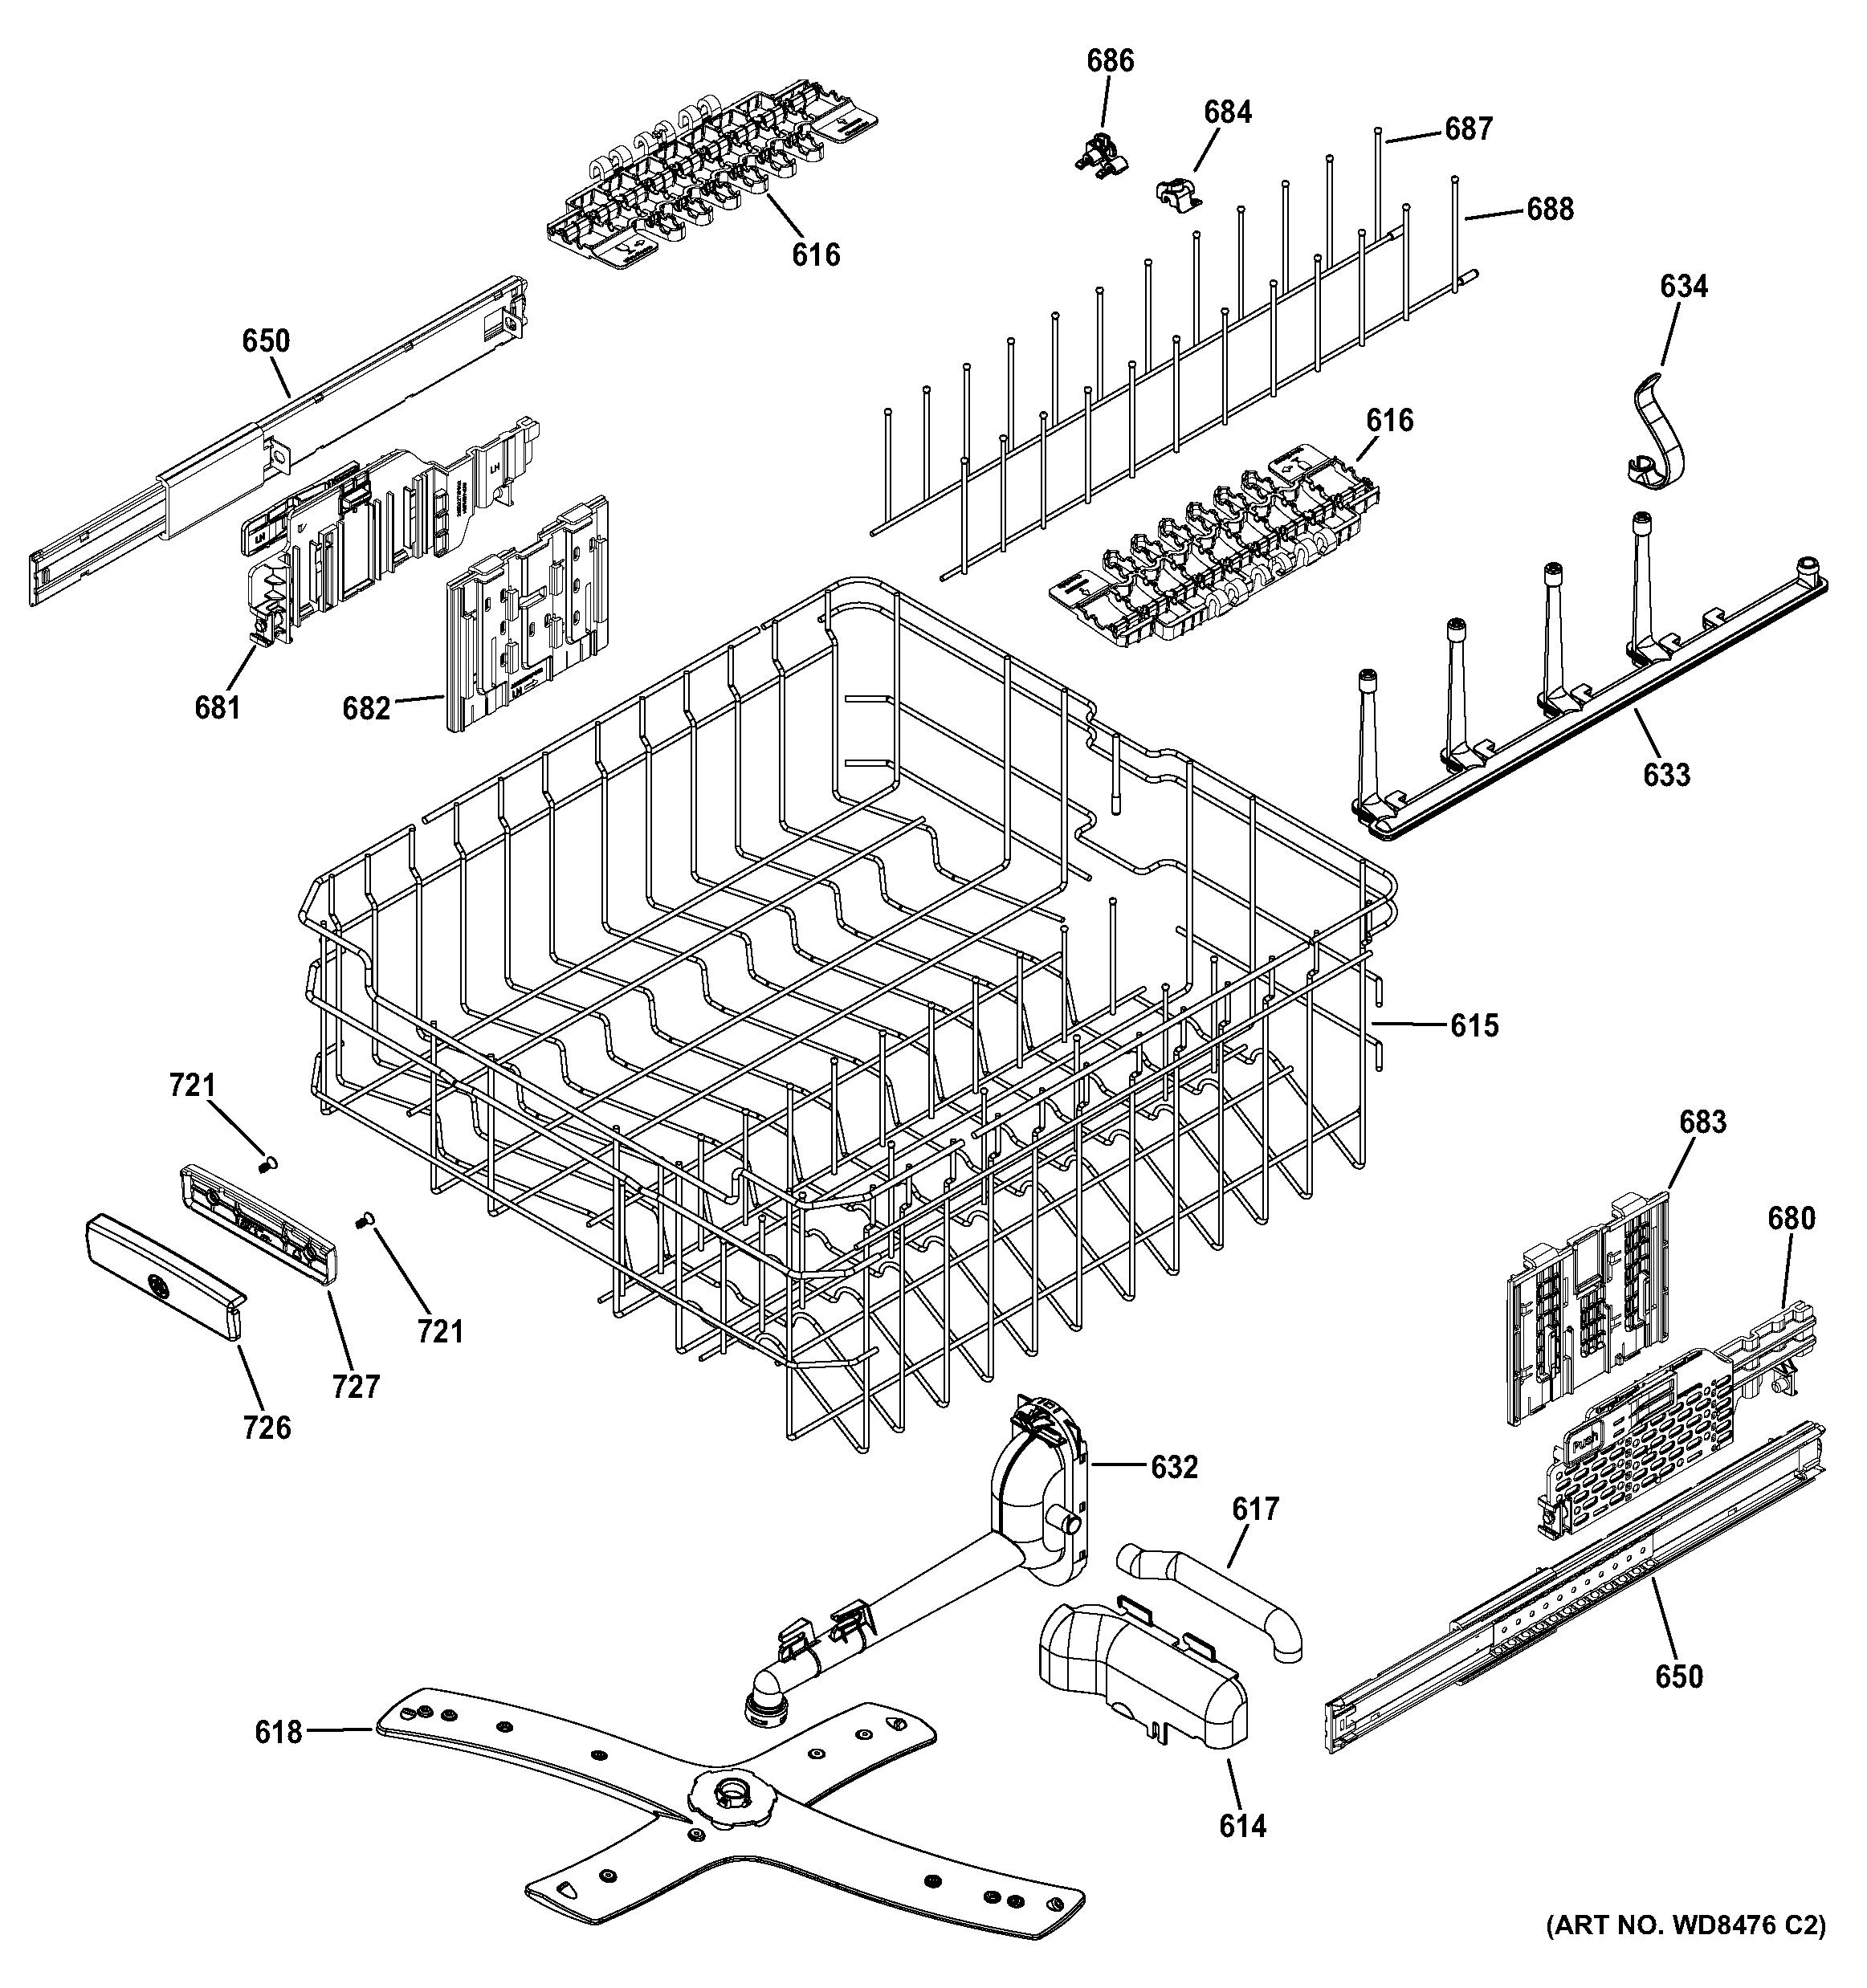 ge dishwasher parts diagram freefordradiocode co uk model pdt750ssf1ss sears partsdirect